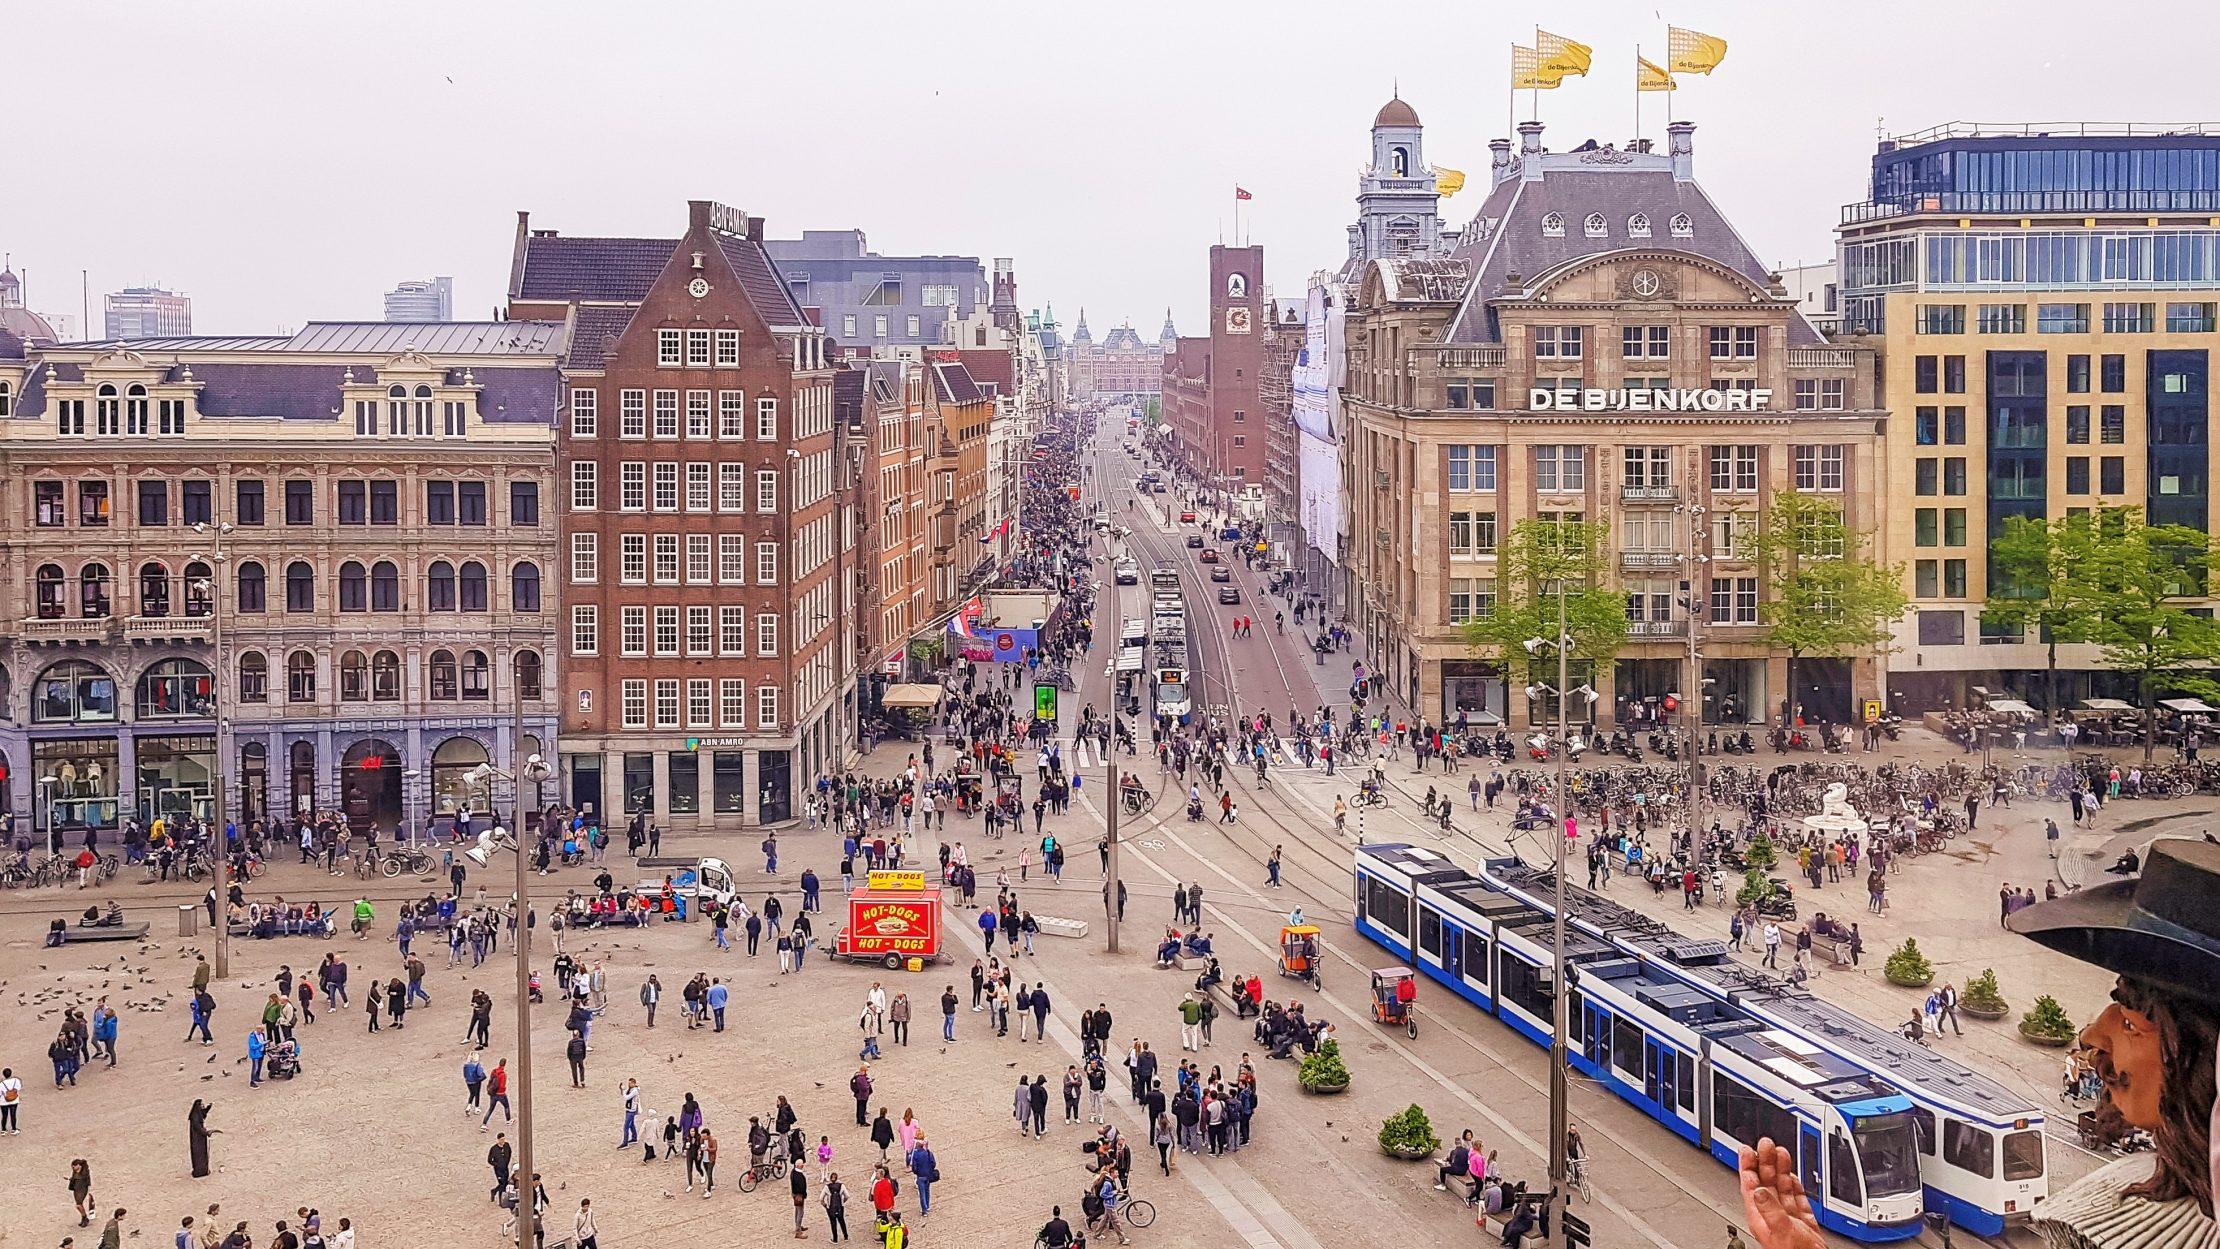 Plaza Dam en Ámsterdam